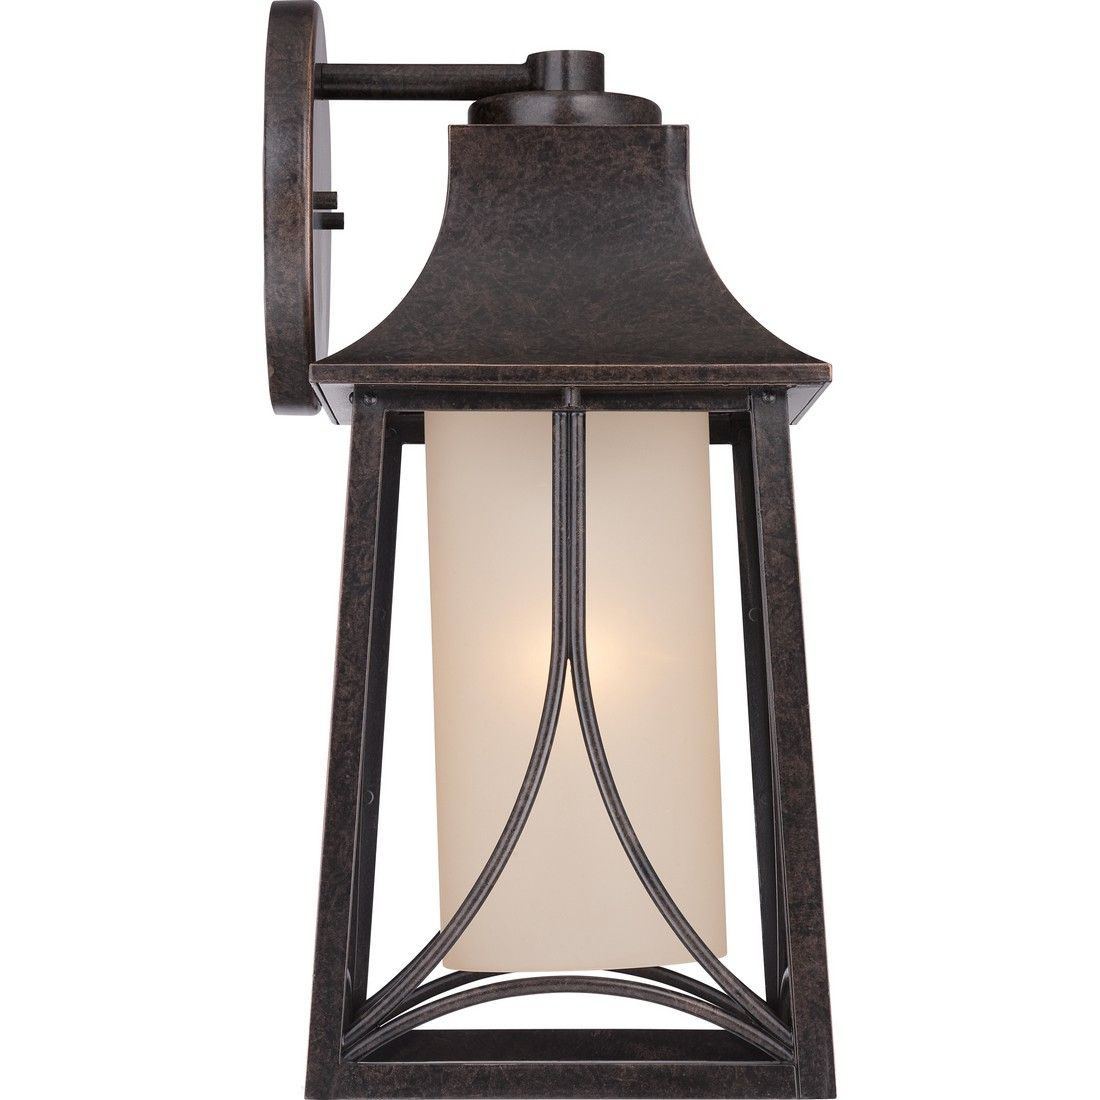 Quoizel Hunter 9 Outdoor Hanging Light In Imperial Bronze